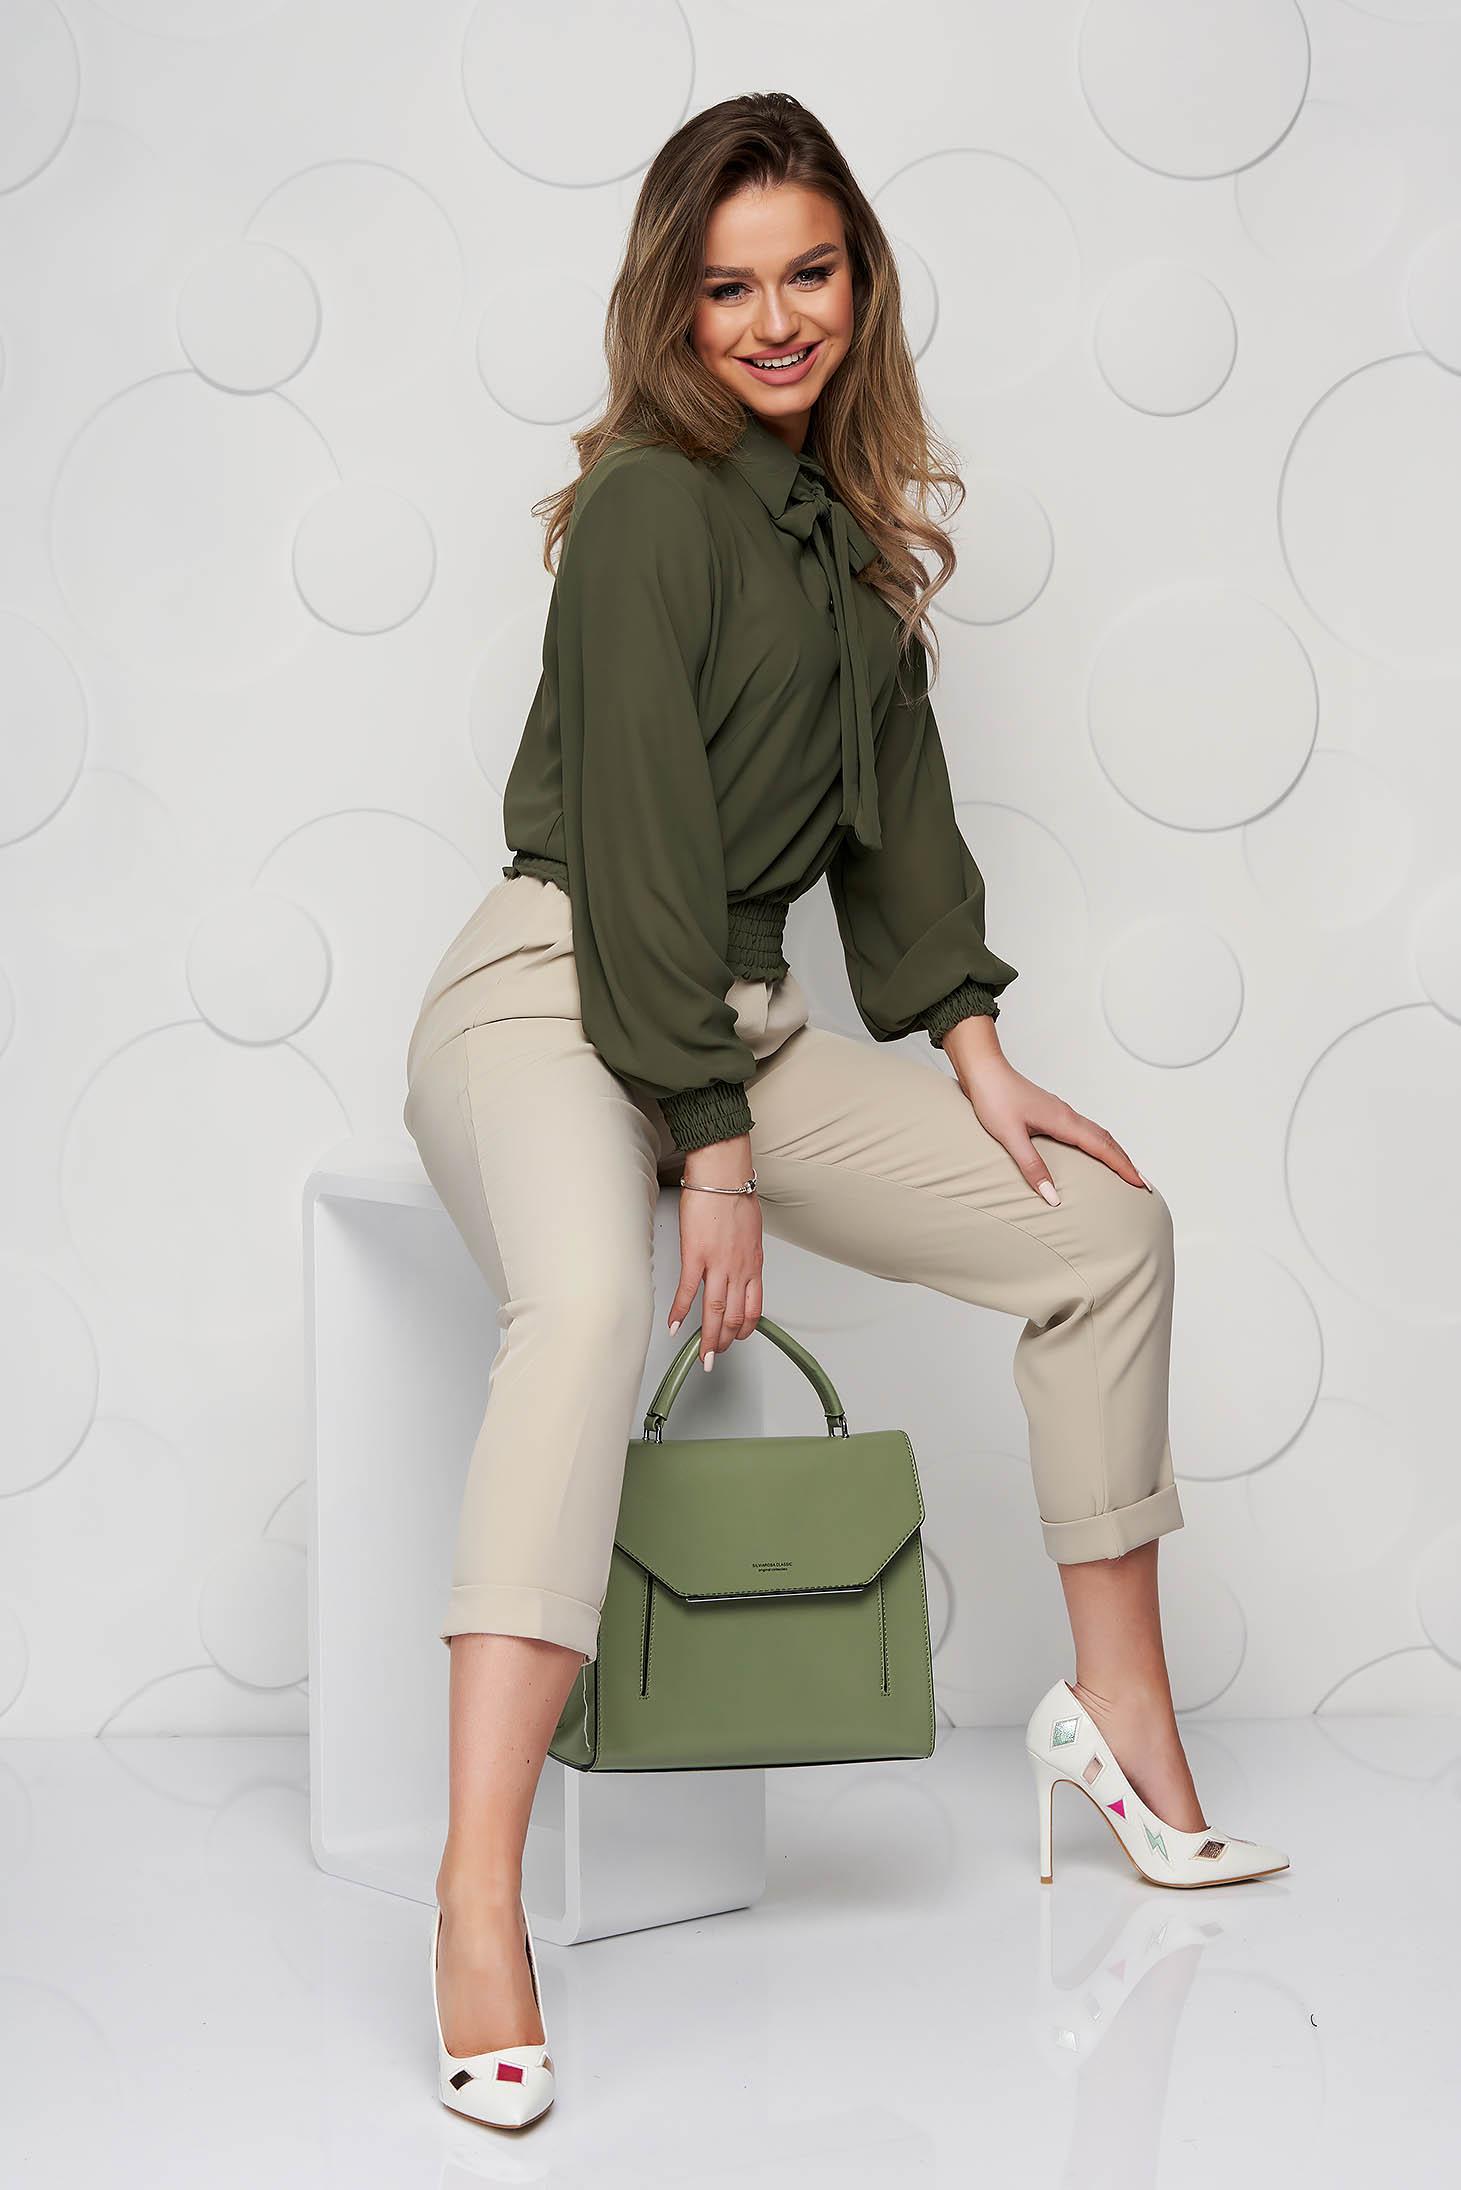 Bluza dama SunShine khaki din voal cu elastic in talie si guler tip esarfa